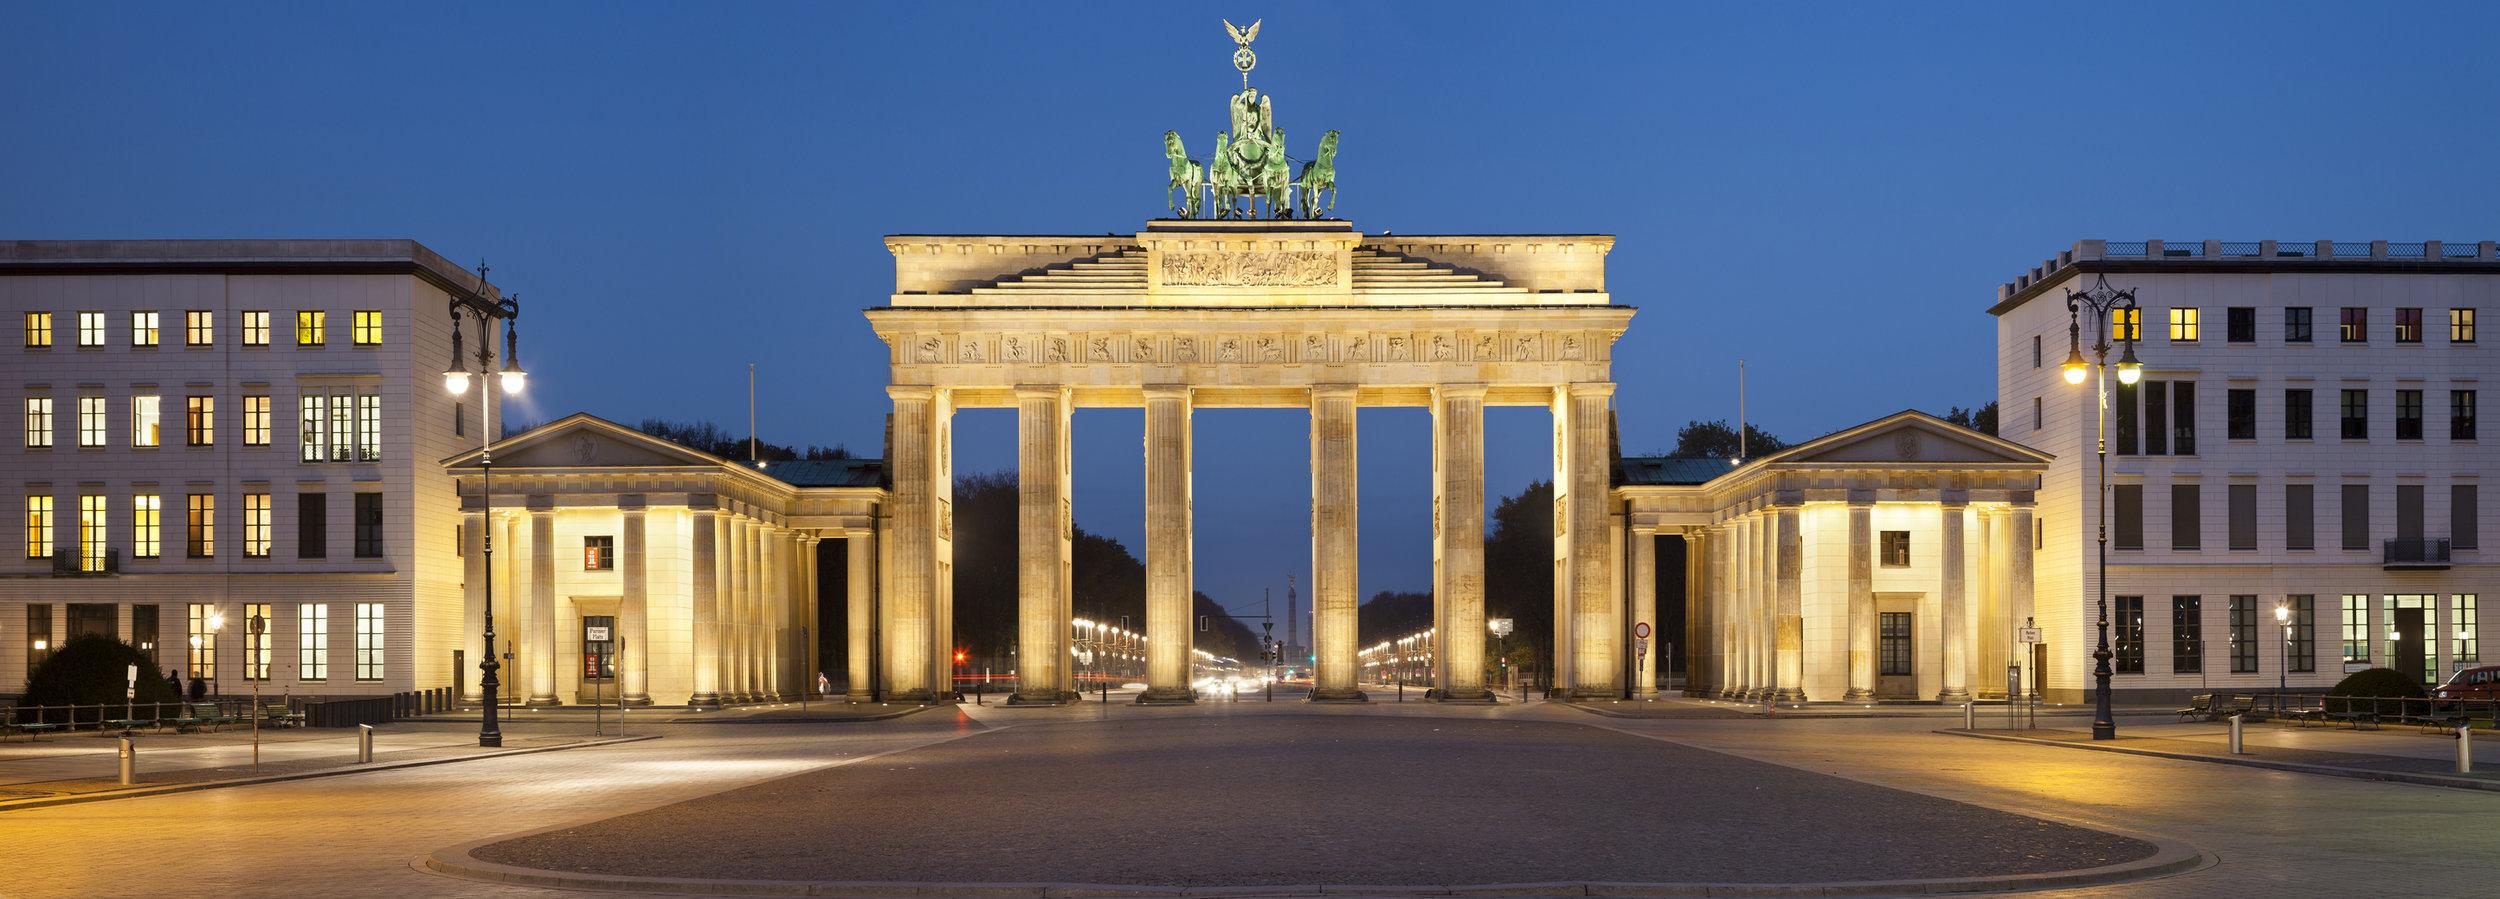 BERLIN - A HISTORY :: BISMARCK TO MERKELIN PARTNERSHIP WITH UNCG'S EMERITUS SOCIETY PROGRAMWITH GUEST LECTURER DR. JEFF JONESJUNE 14 to 23JUNE 25 TO JULY 1, 2020